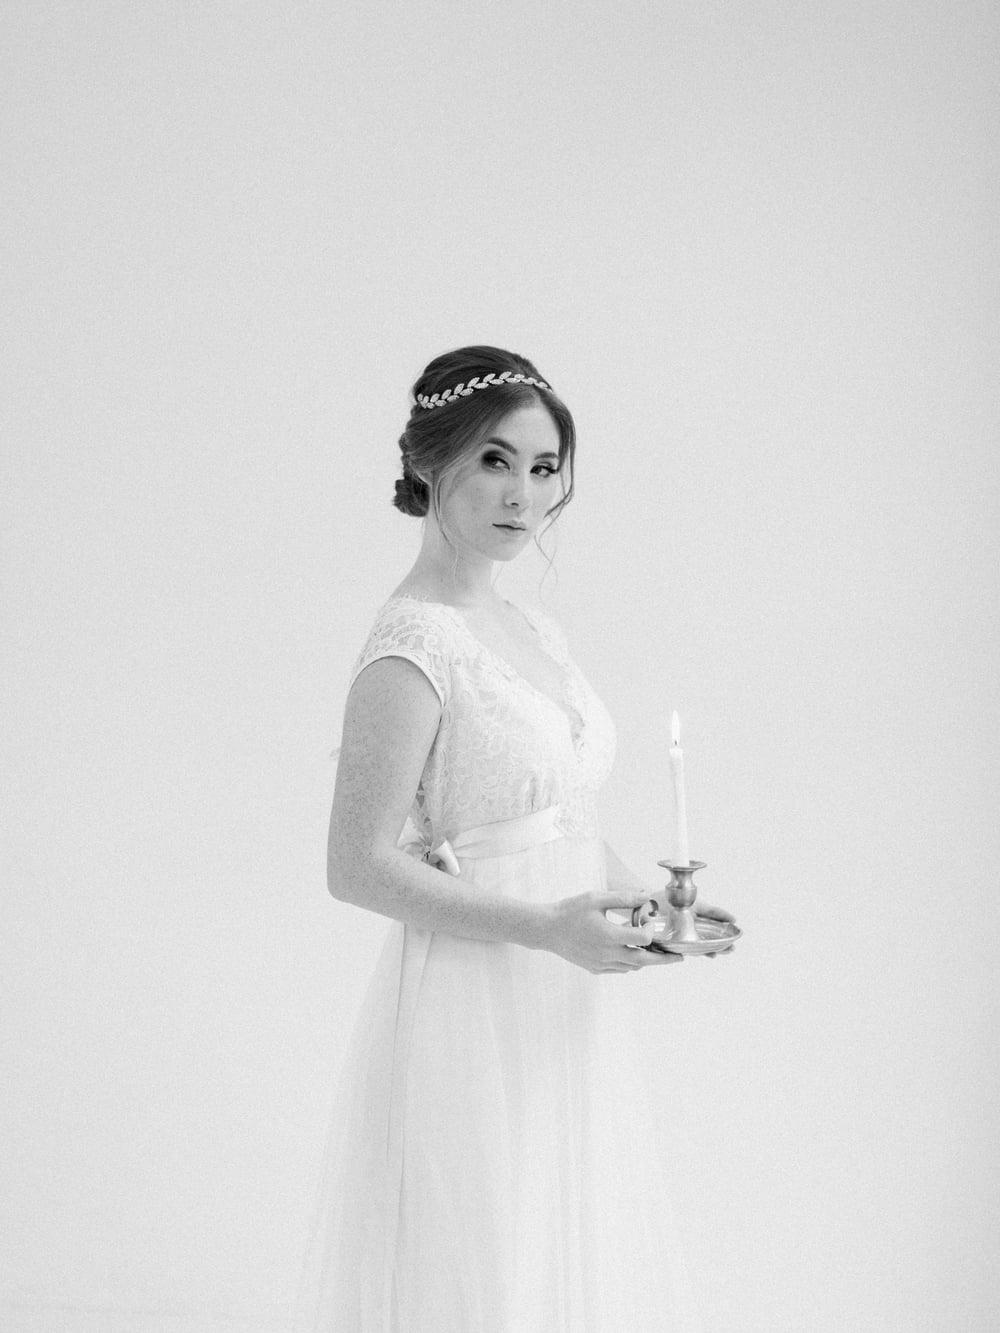 jane-austen-wedding-inspiration-shoot-lace-19.jpg